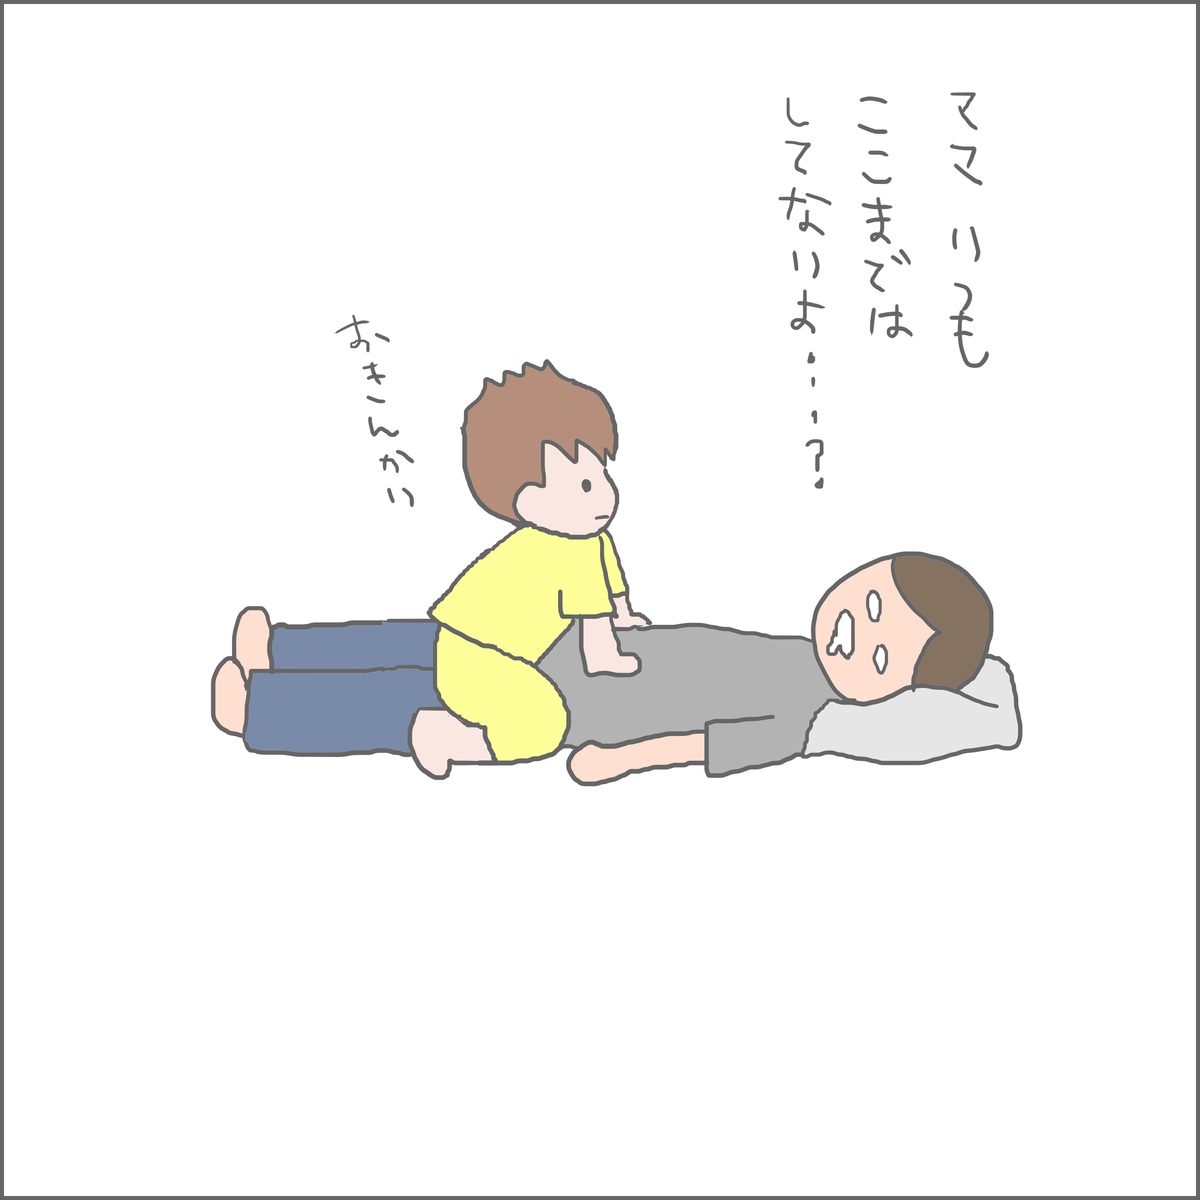 f:id:ika_yoshi:20210529034452j:plain